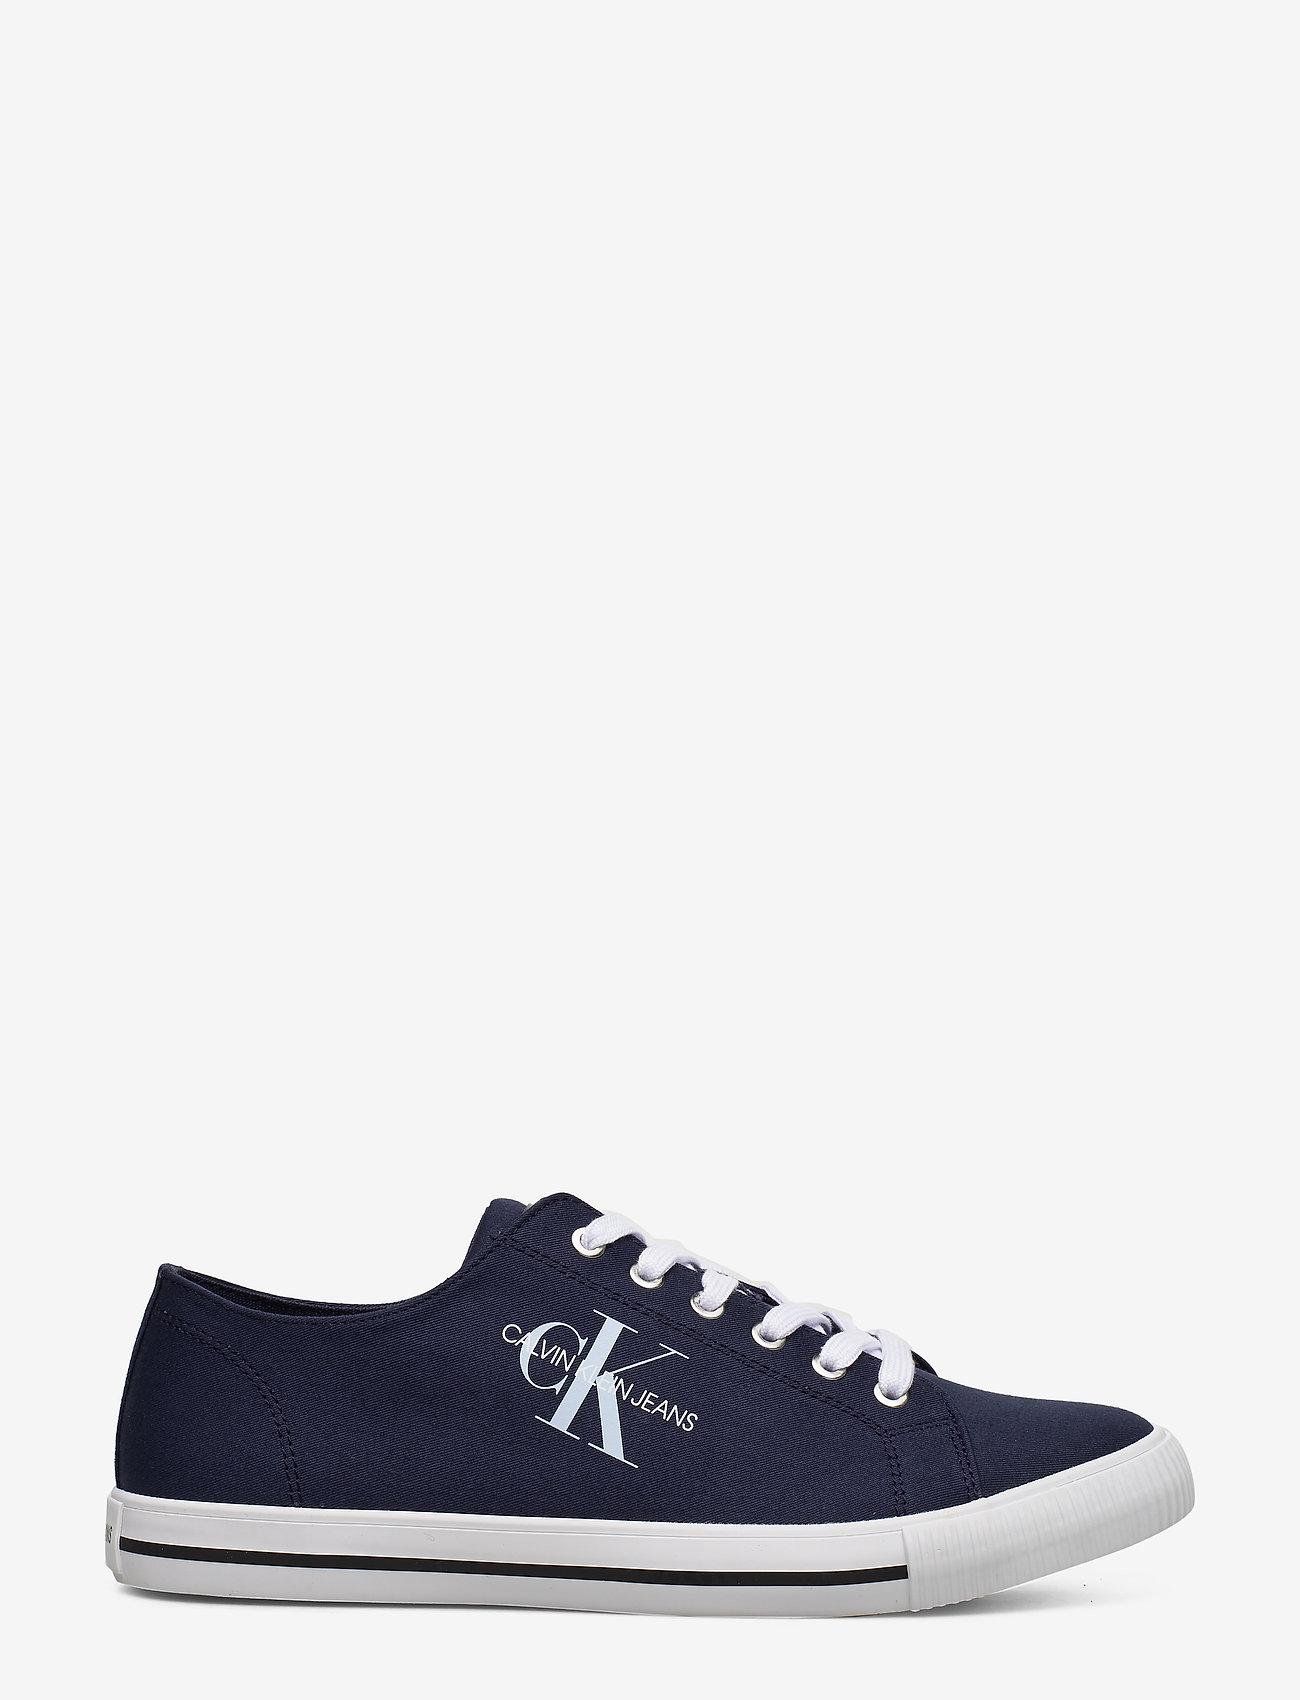 Calvin Klein - AURELIO - laag sneakers - navy - 1